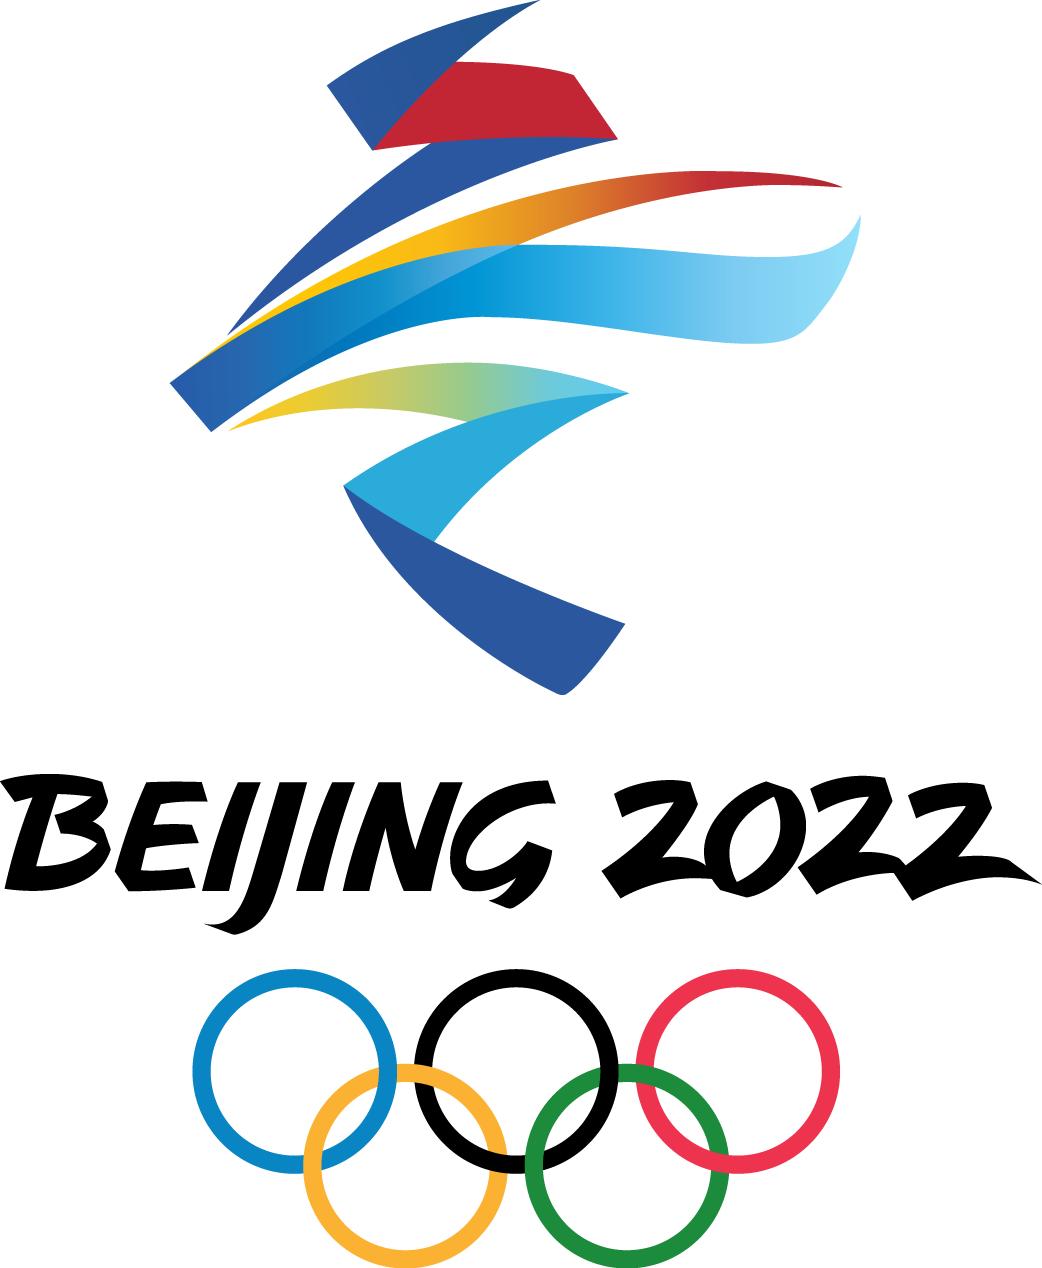 2022 Beijing Olympics Primary Logo Winter Olympics Winter Olympics Chris Creamer S Sports Logos Page Sportslogos Net